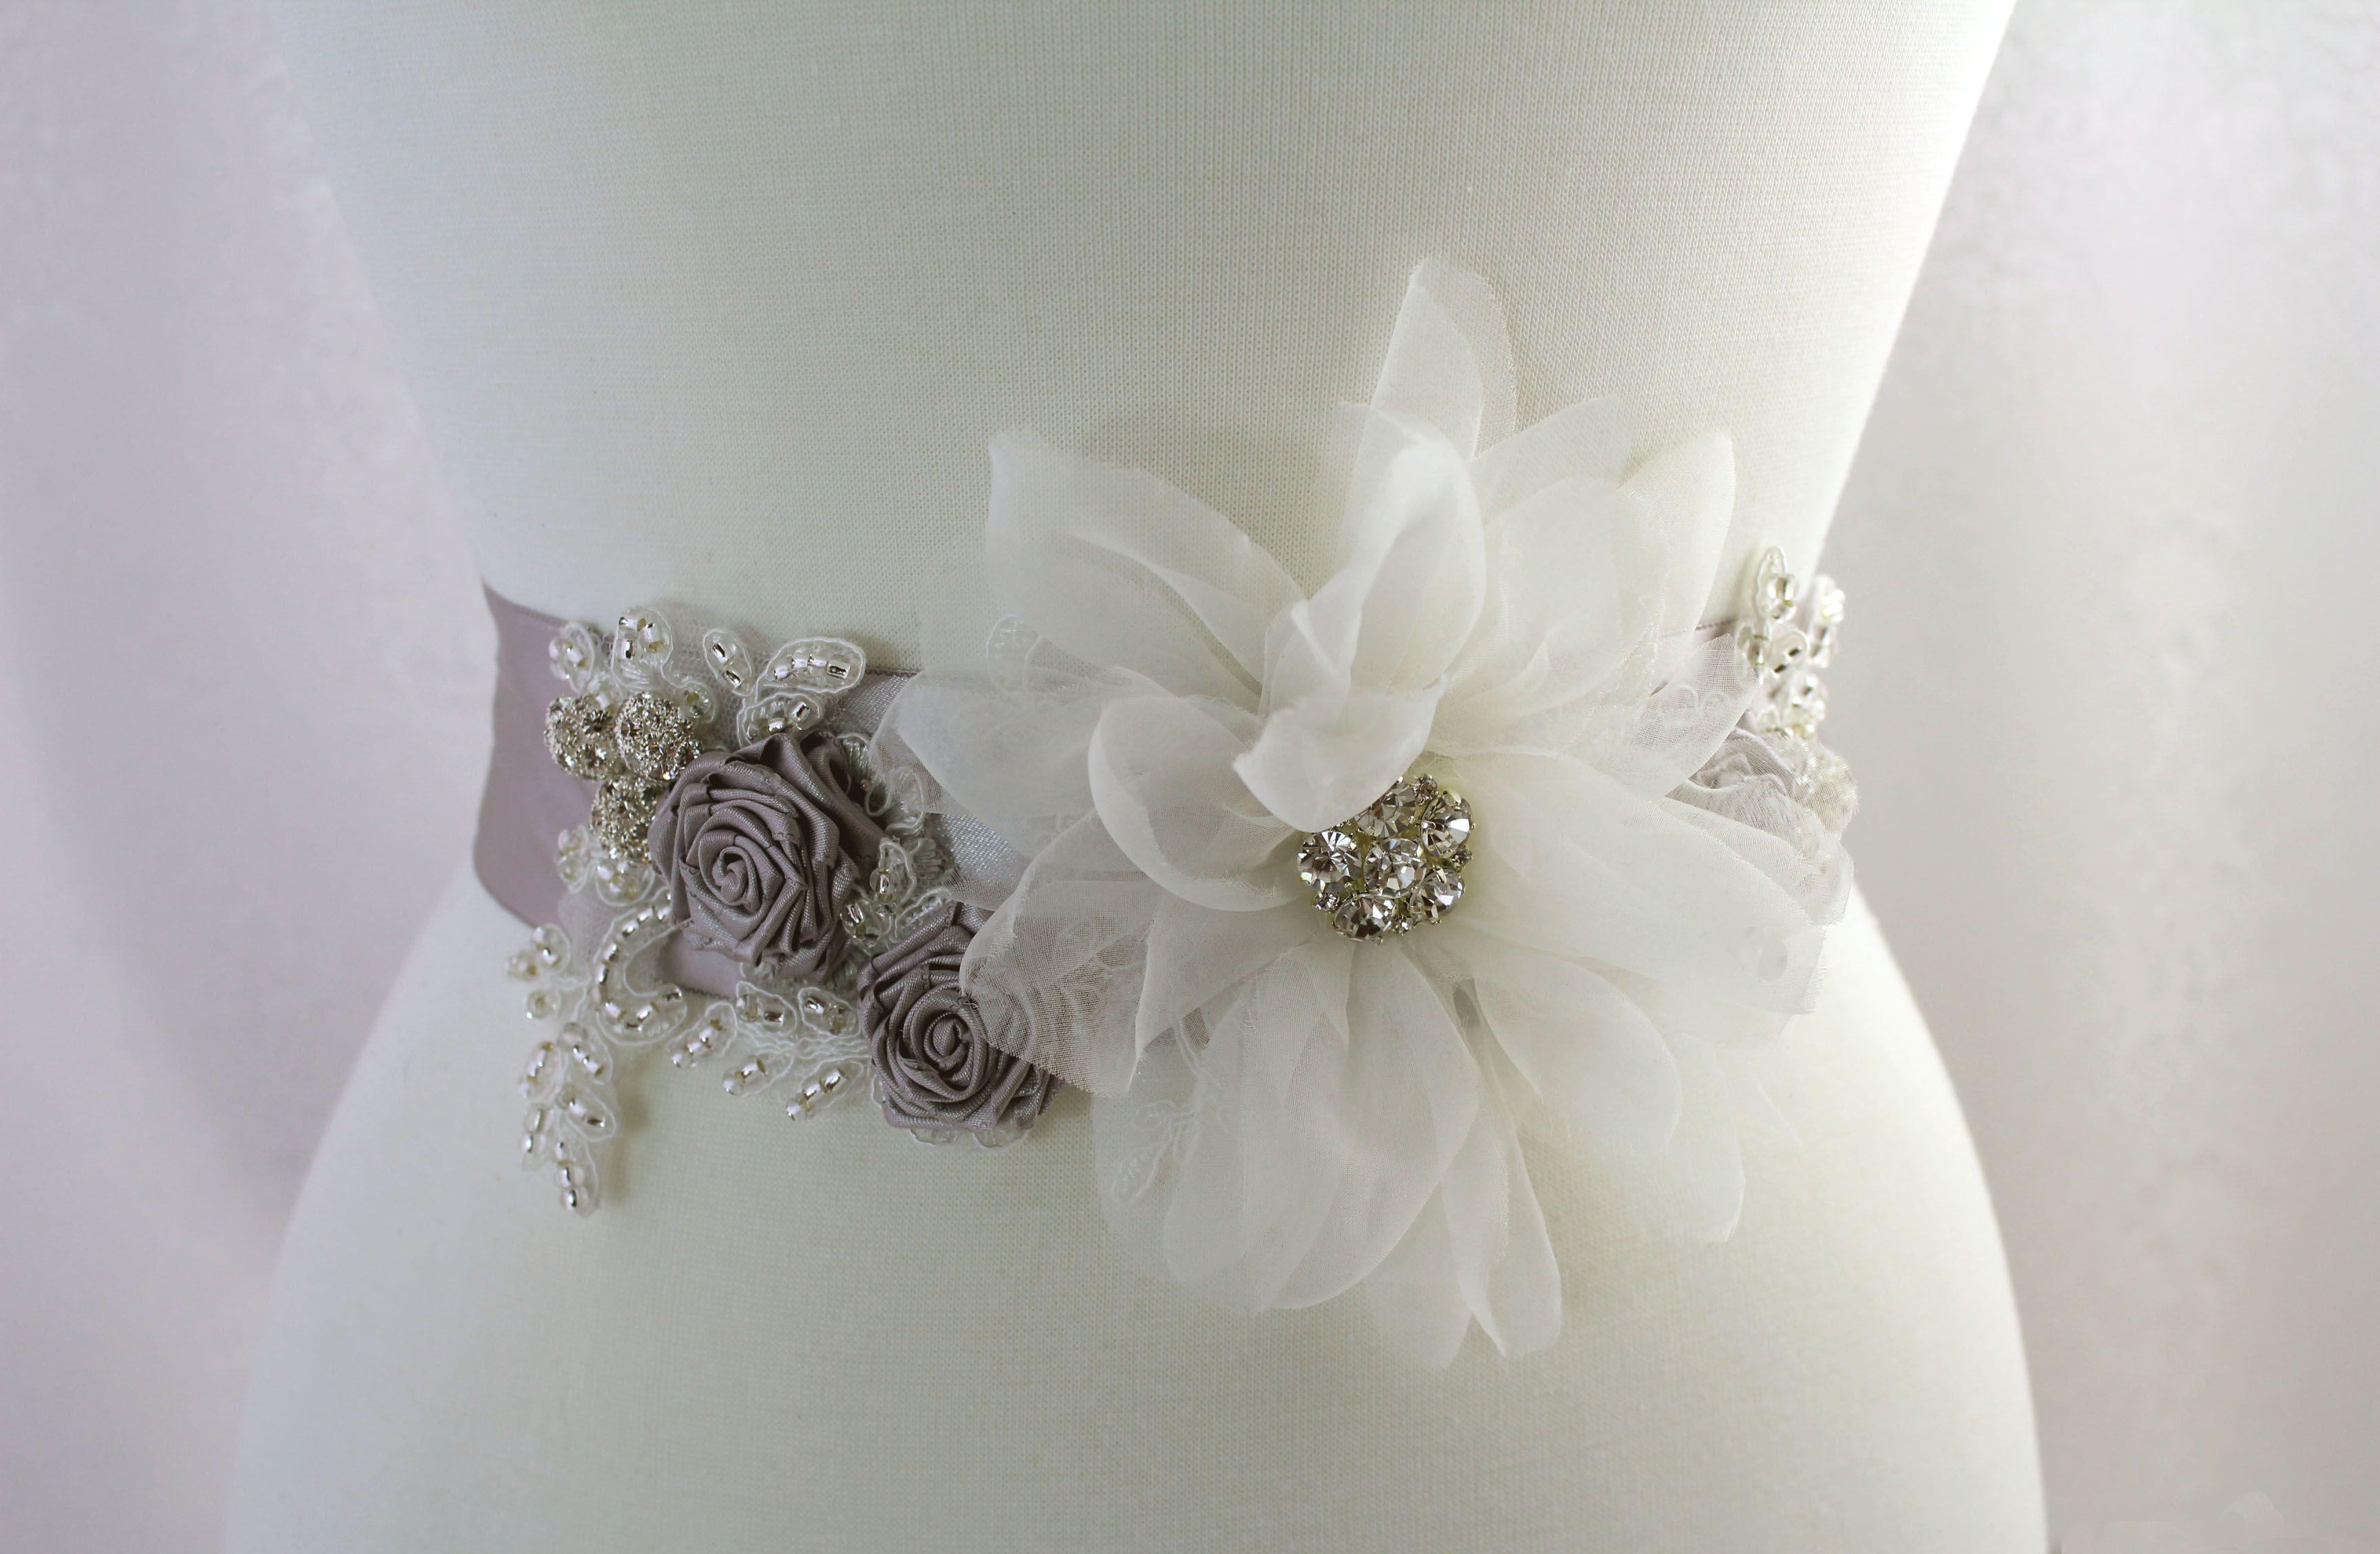 Gray Sash, Pewter bridal sash rhinestone from Mitzy and Mitzy at etsy